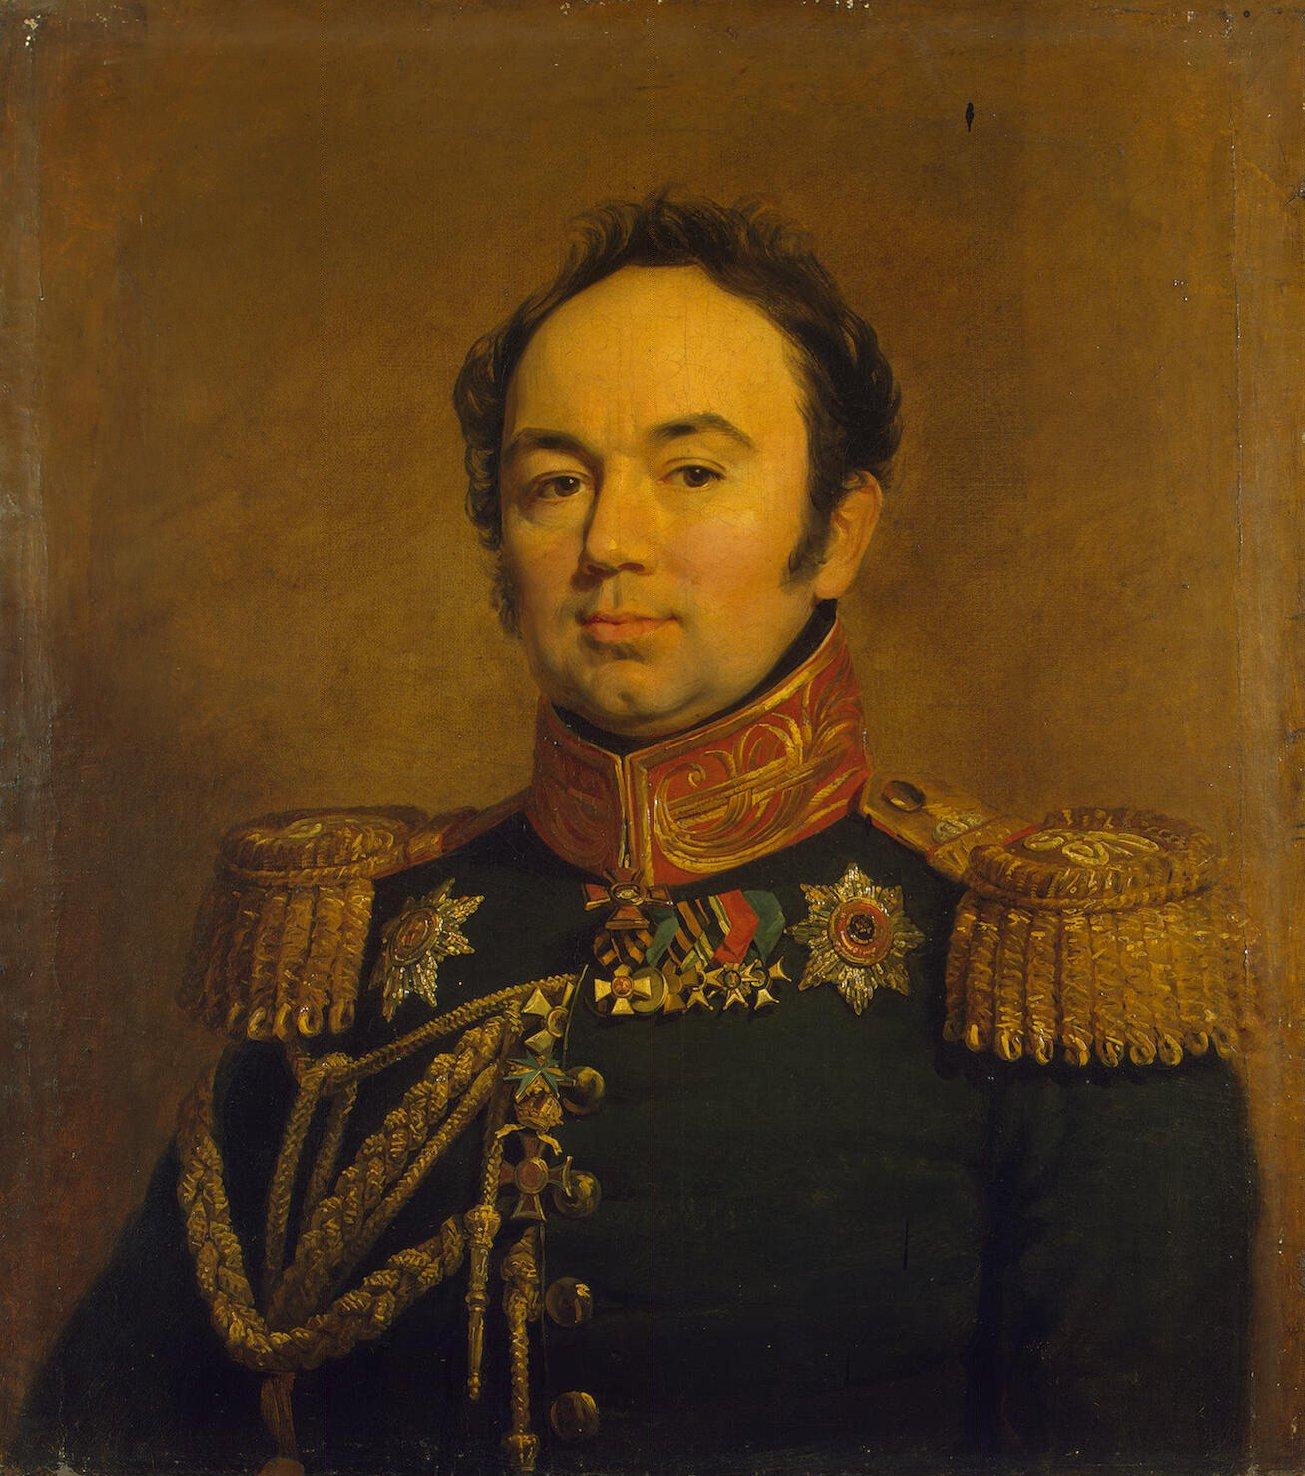 Закревский, Арсений Андреевич